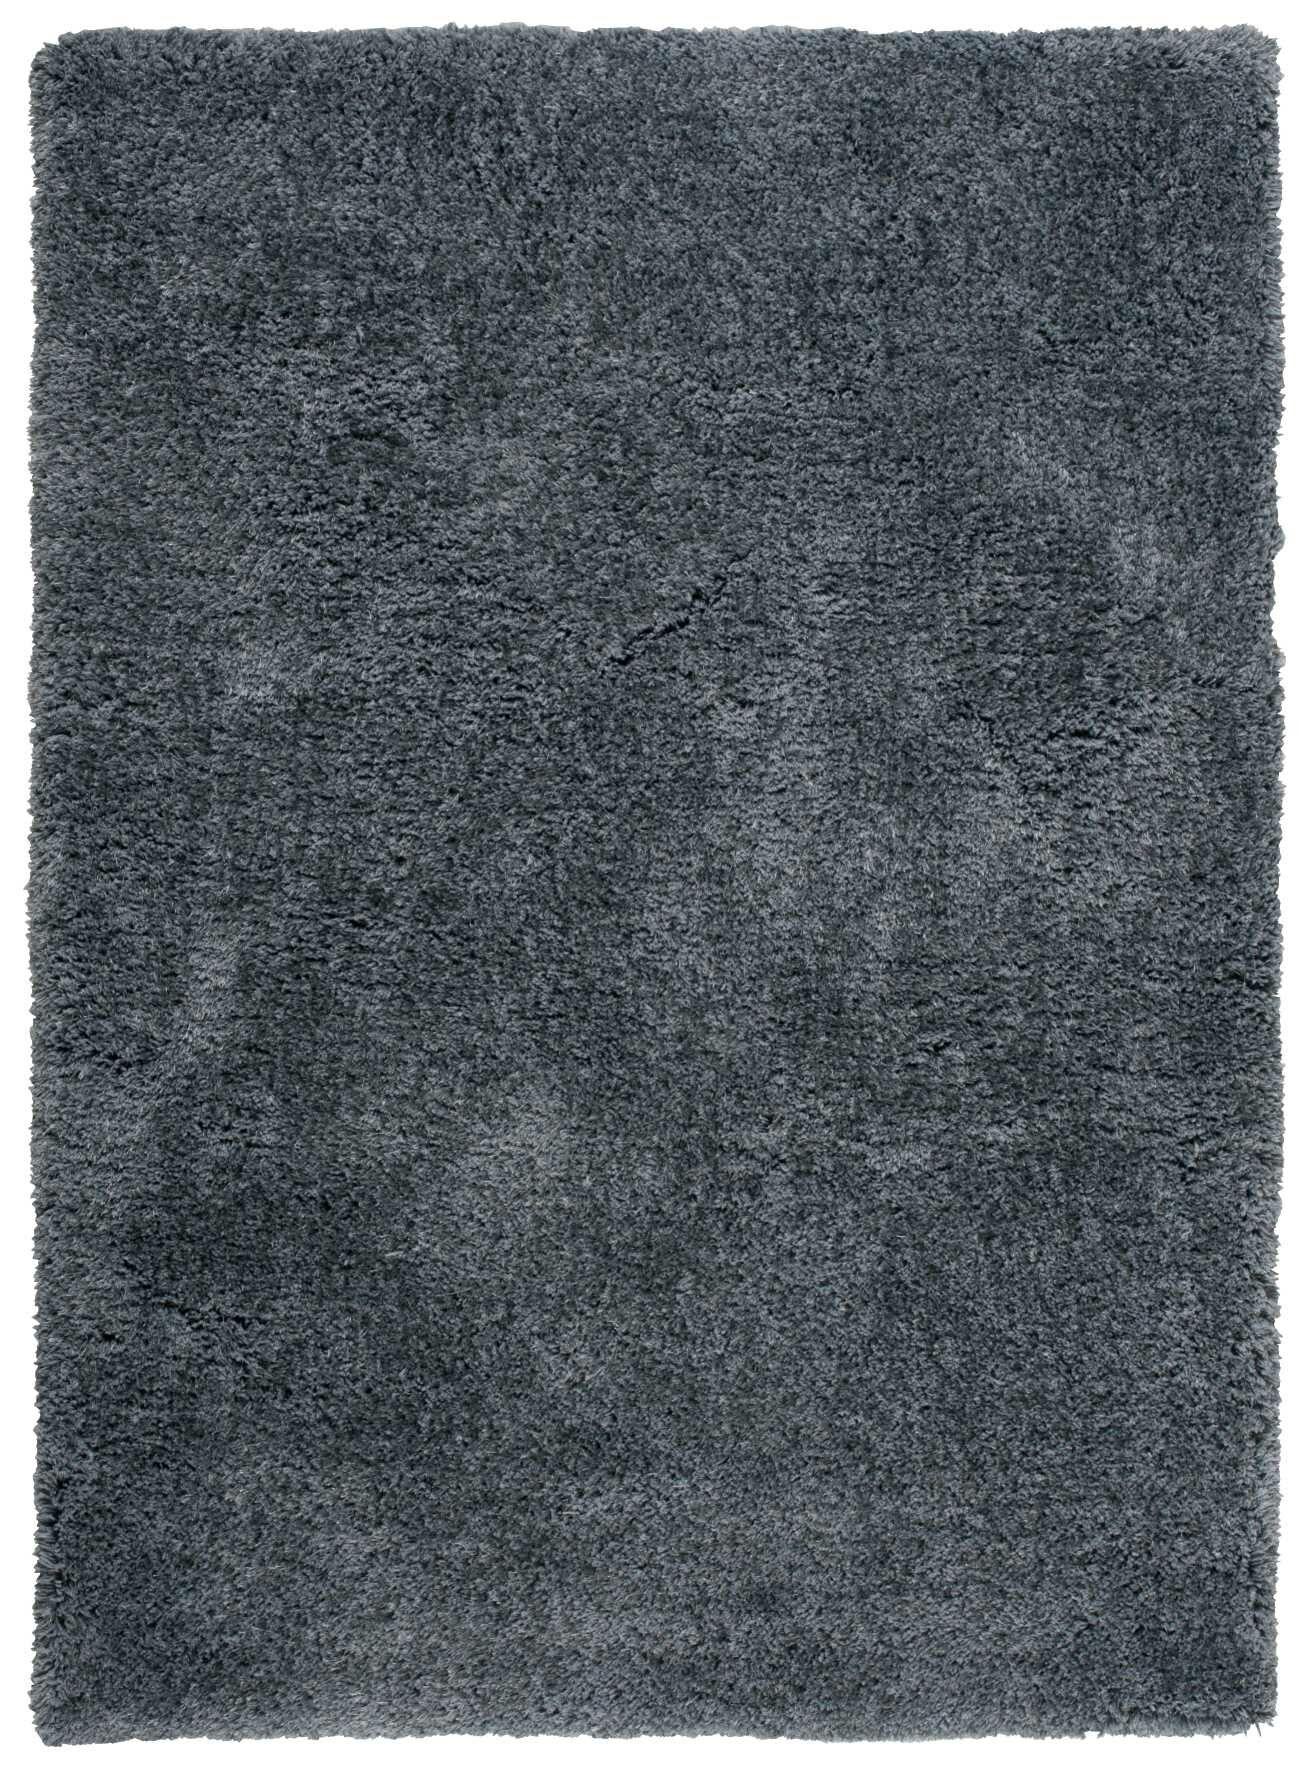 Vandiver Hand-Tufted Dark Grey Area Rug Rug Size: Rectangle 7'6